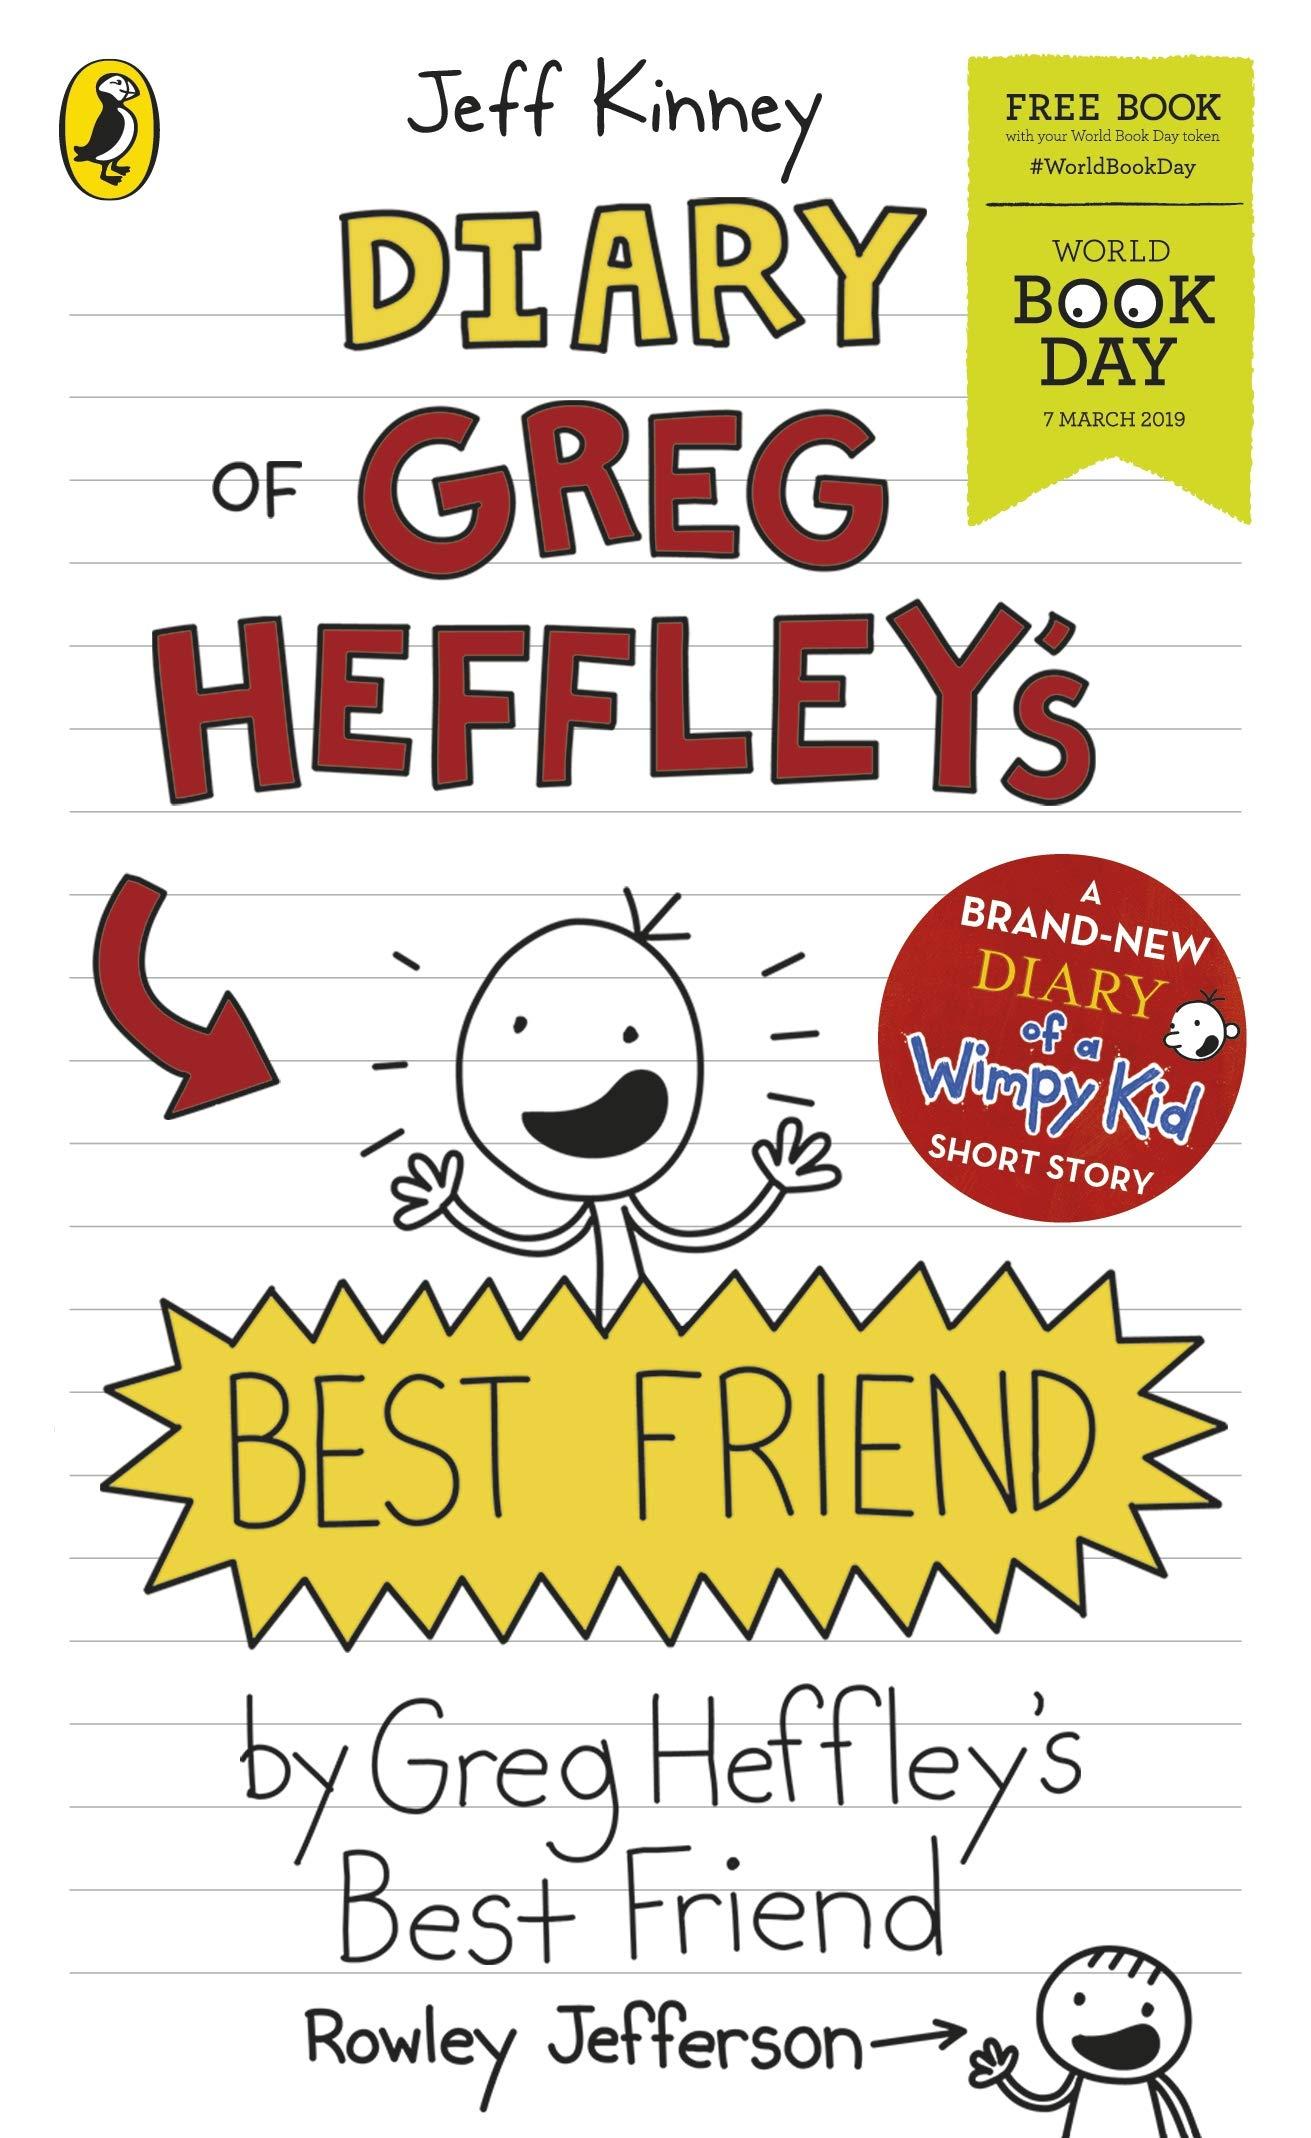 Amazon Com Diary Of Greg Heffley S Best Friend World Book Day 2019 Diary Of A Wimpy Kid 9780241388822 Kinney Jeff Books